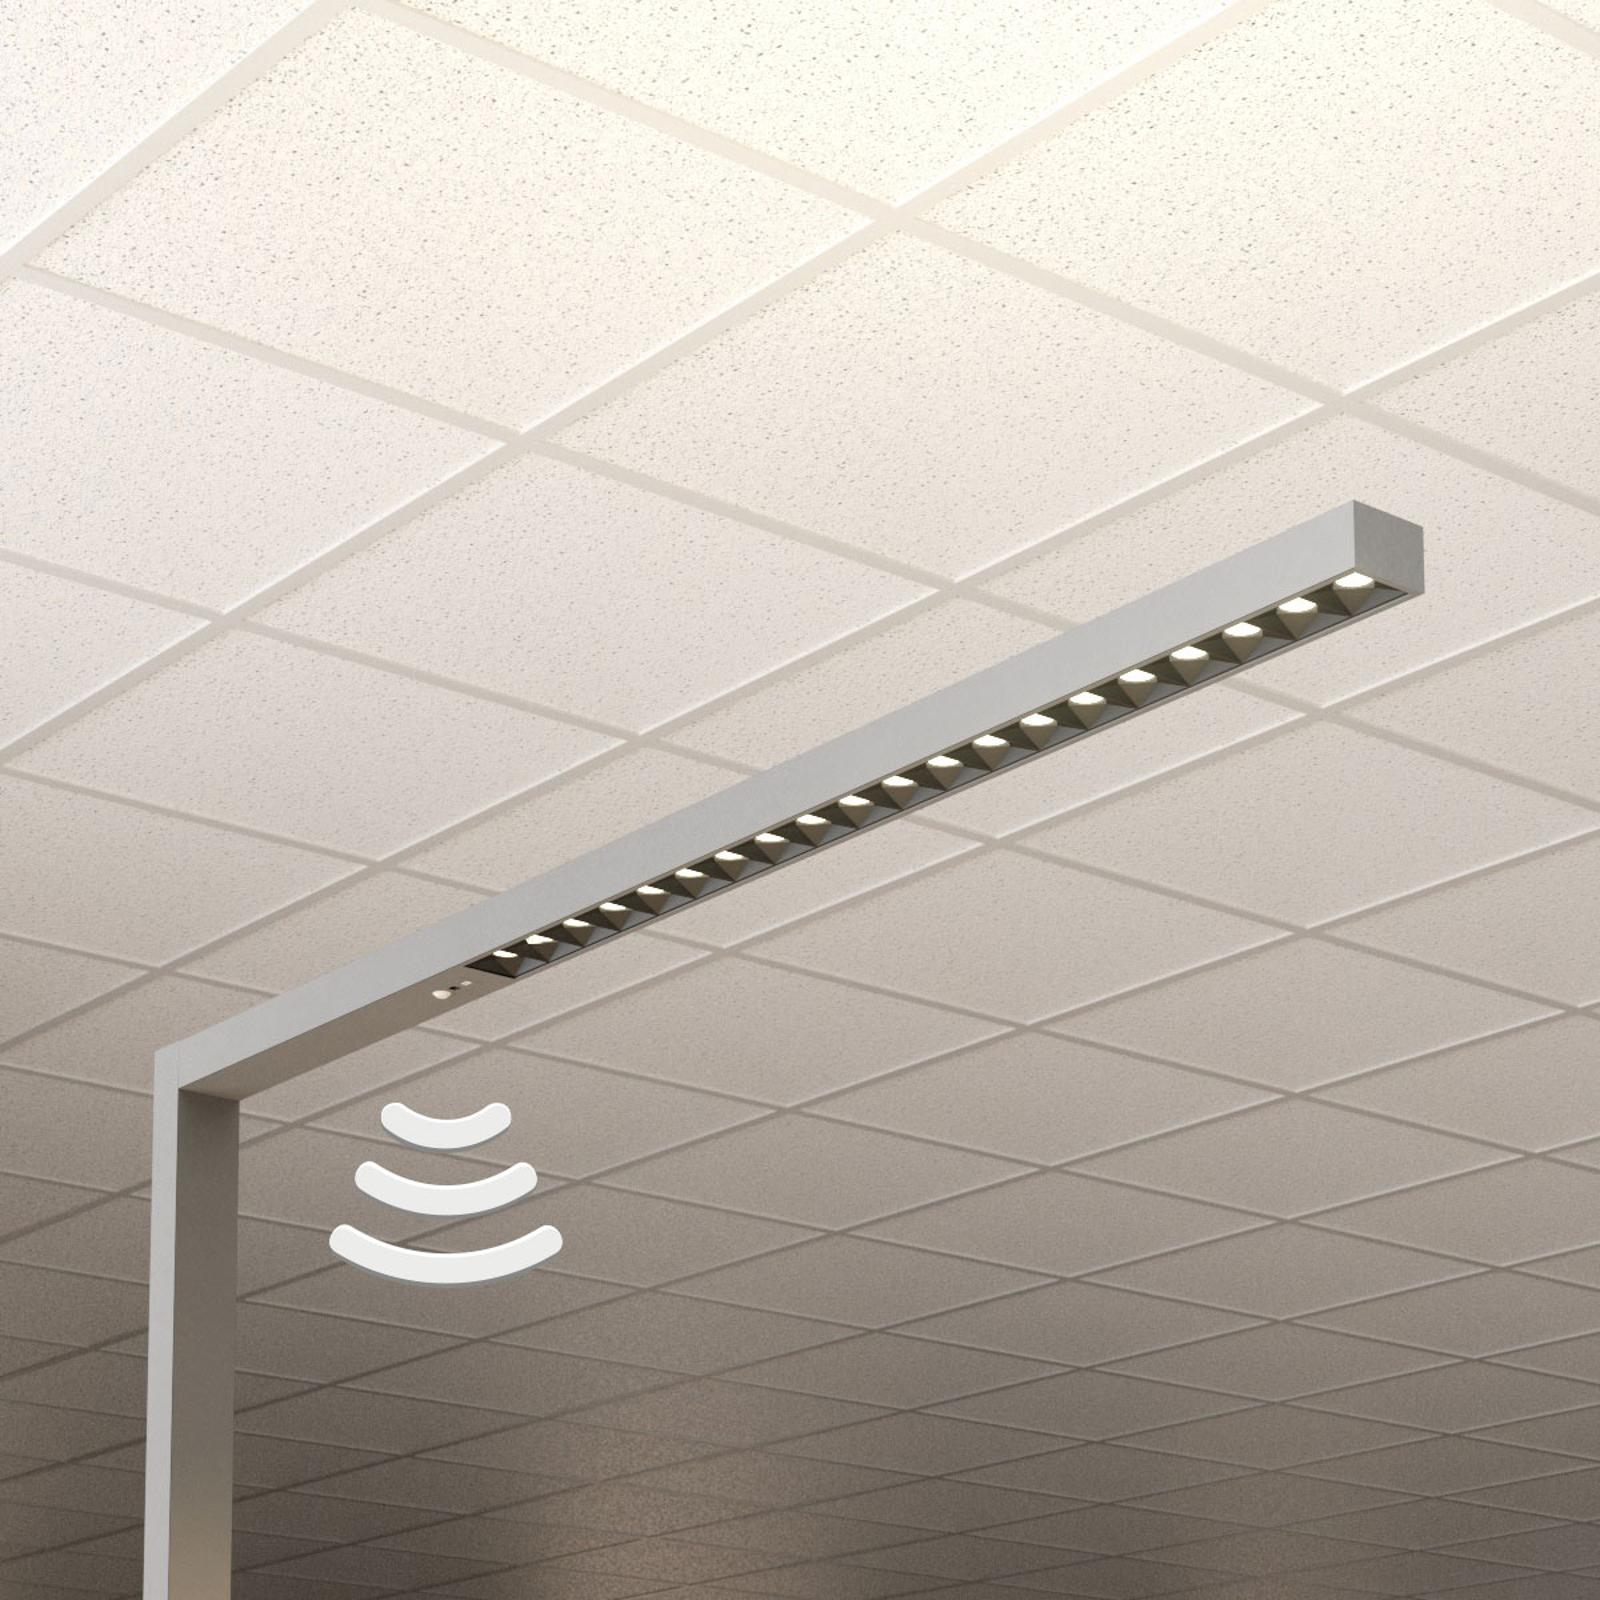 Lampa stojąca biurowa LED Laris, srebrna, 4000 K